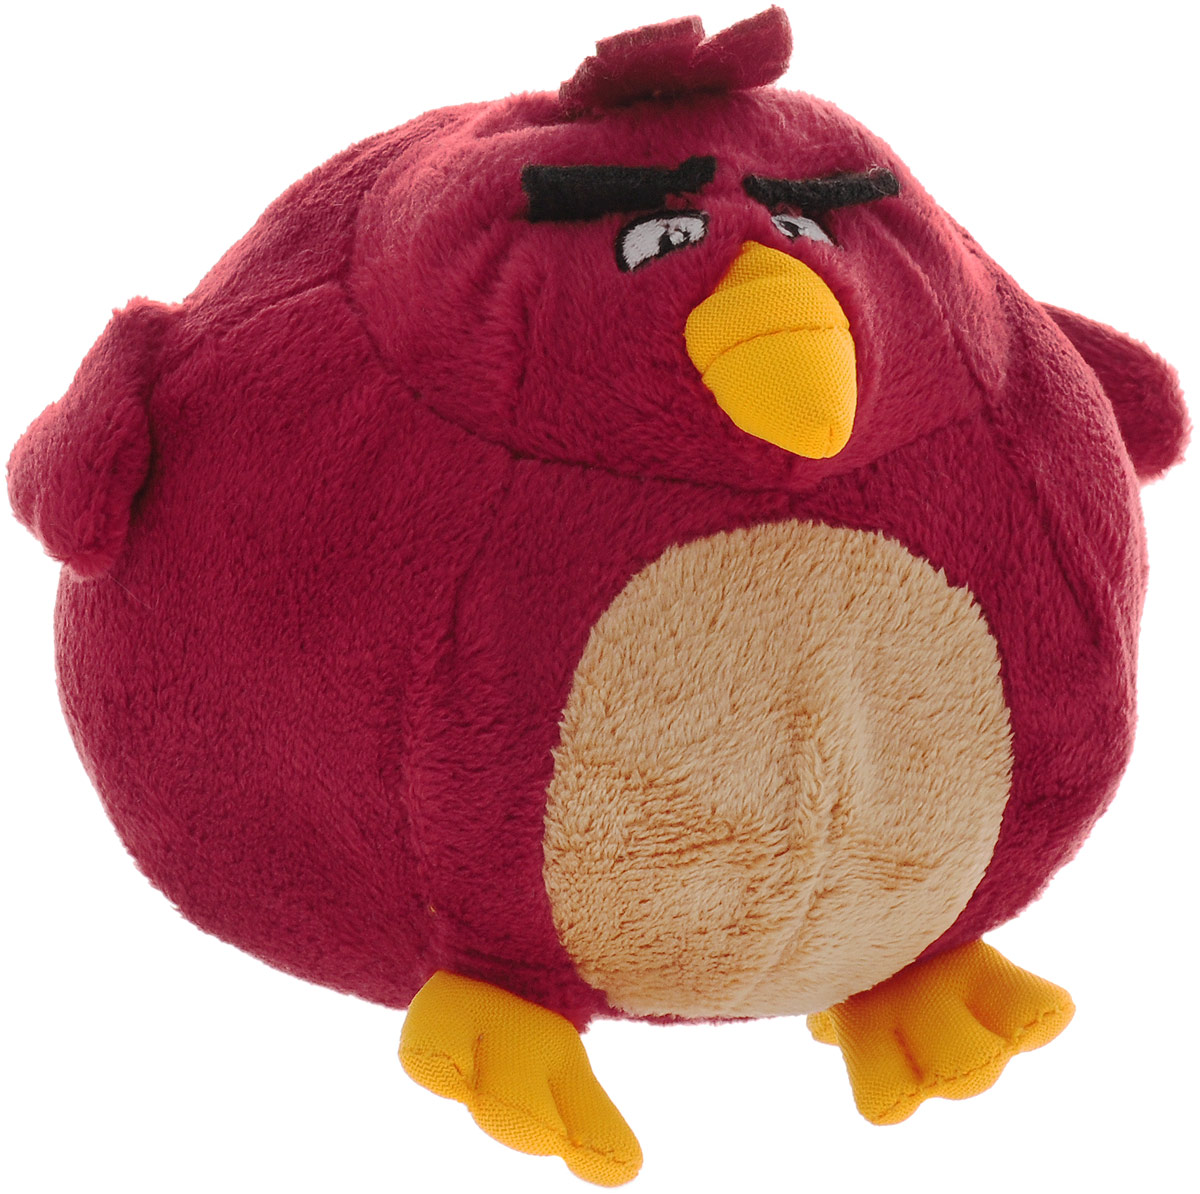 Angry Birds Мягкая игрушка Птица Terence 13 см angry birds мяг игр 20см желтая птица и игрушка подвеска с клипом 7см